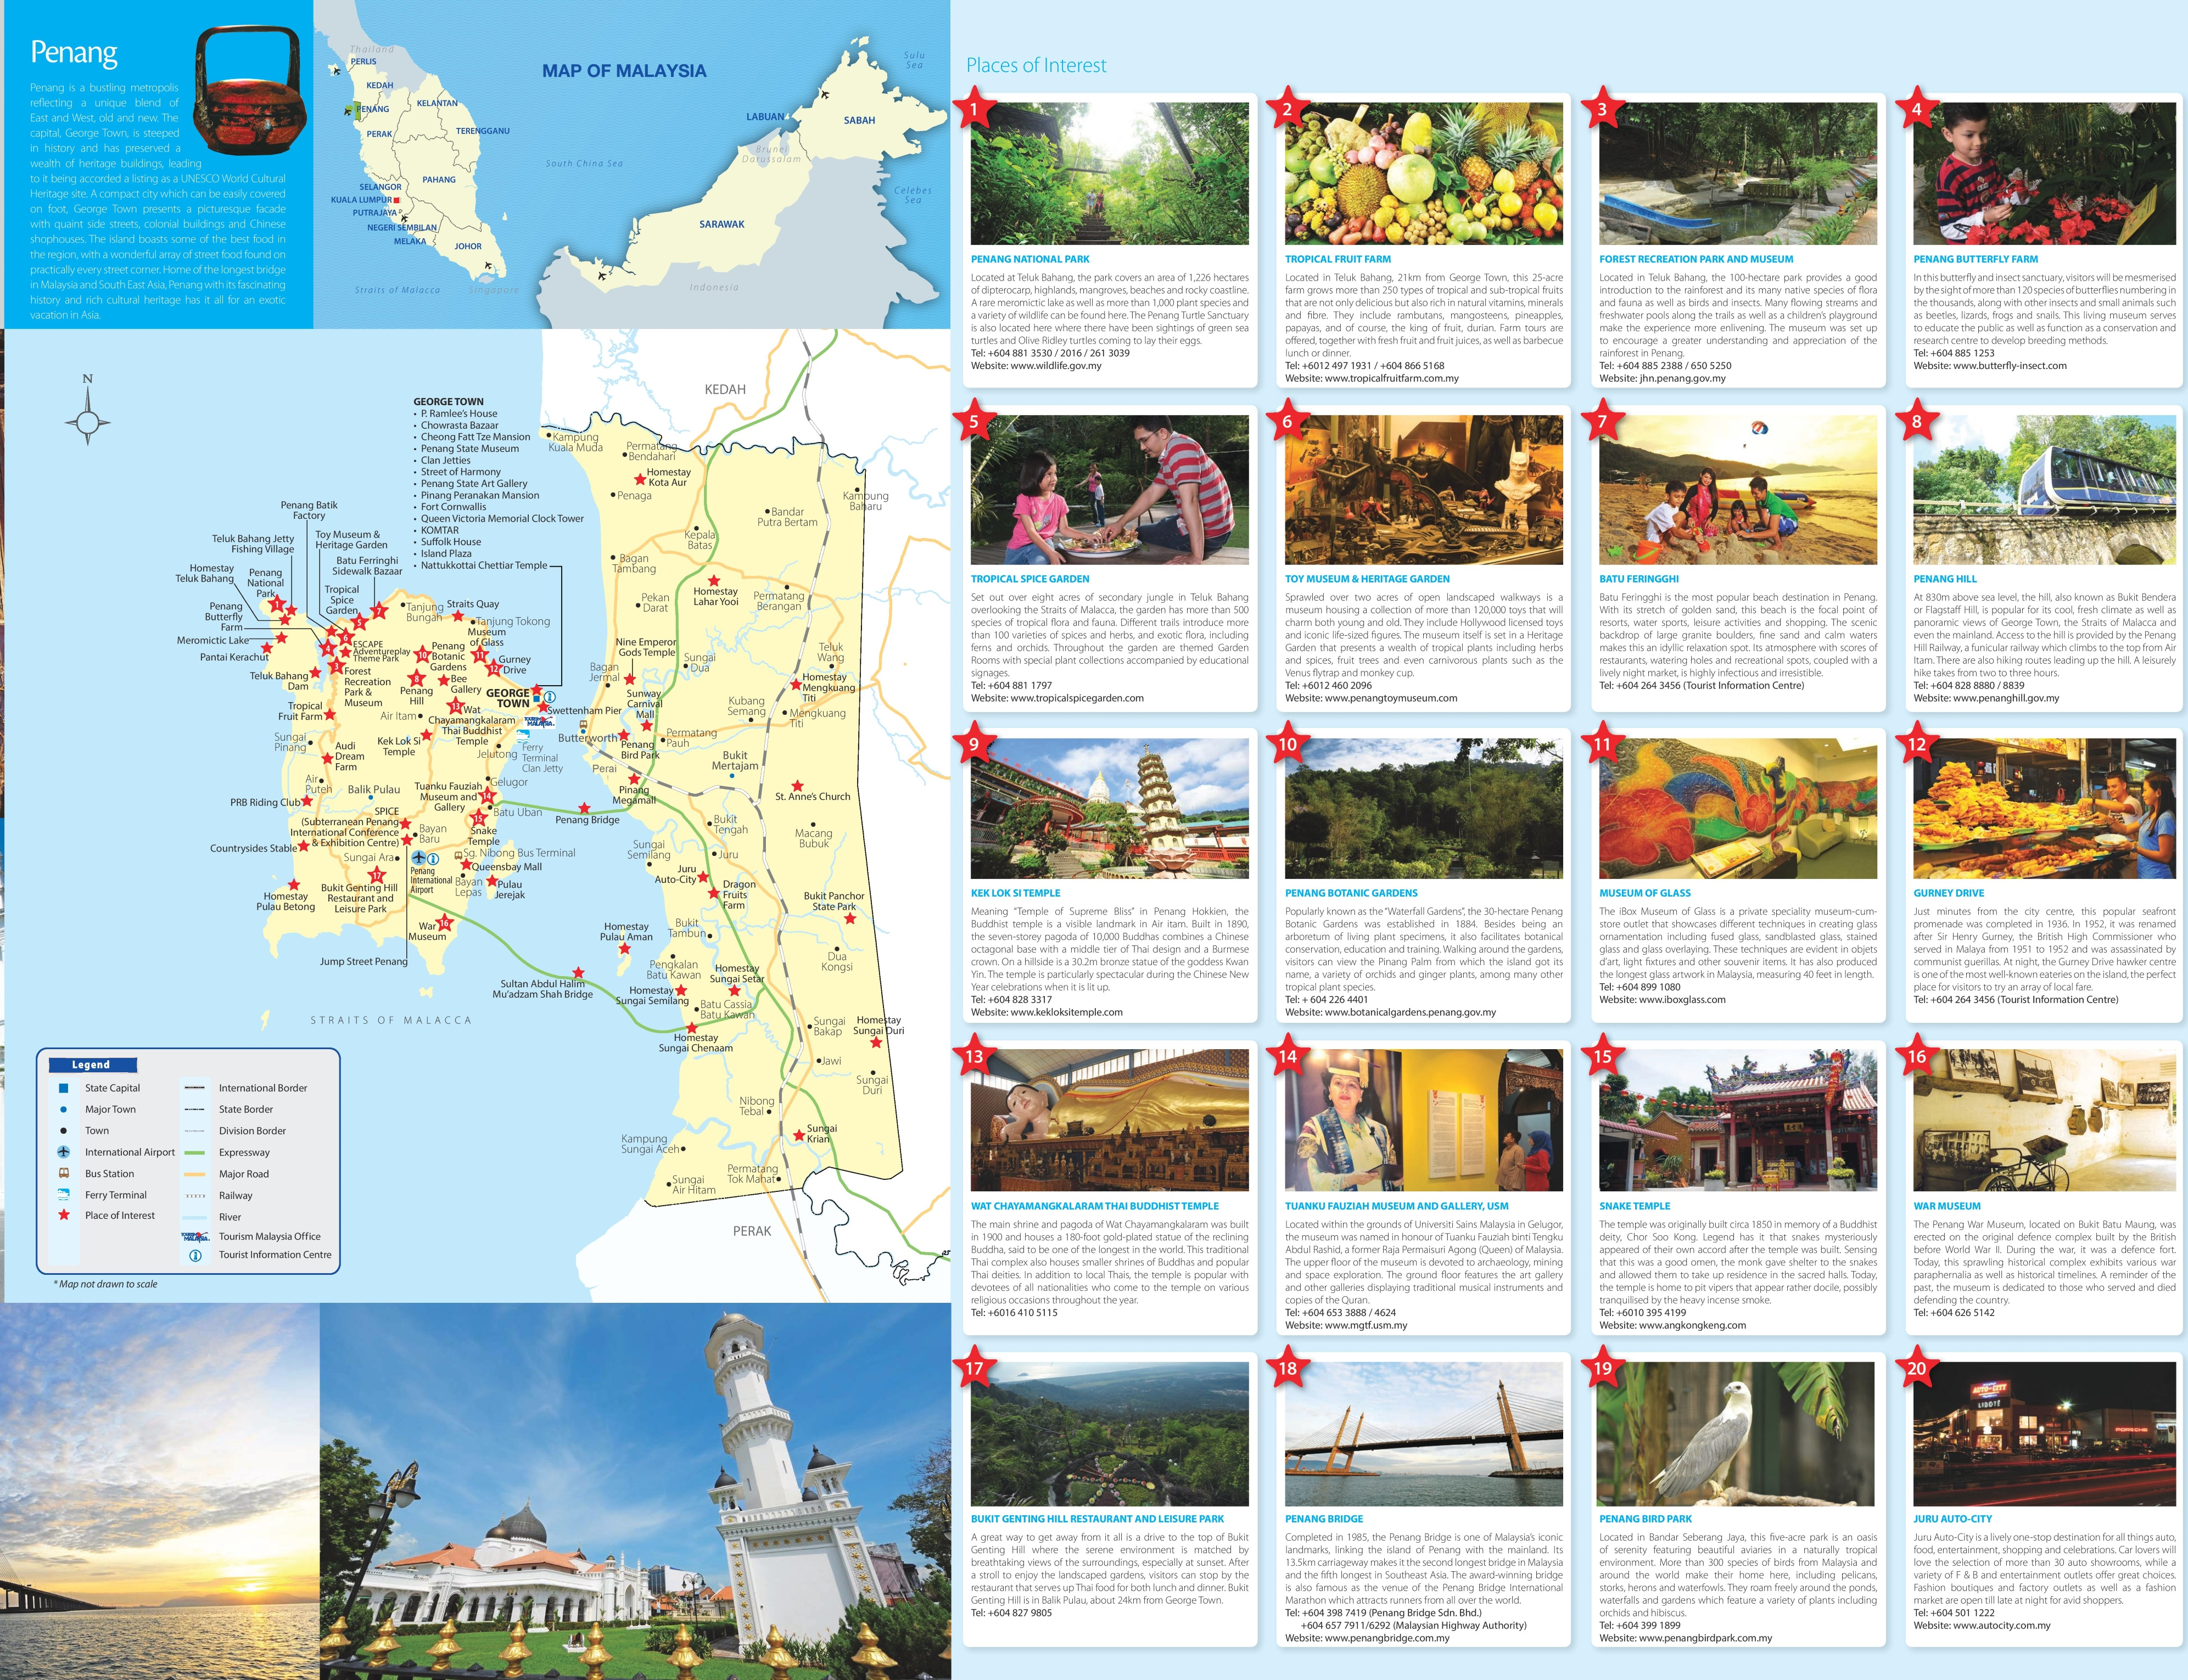 Penang tourist map